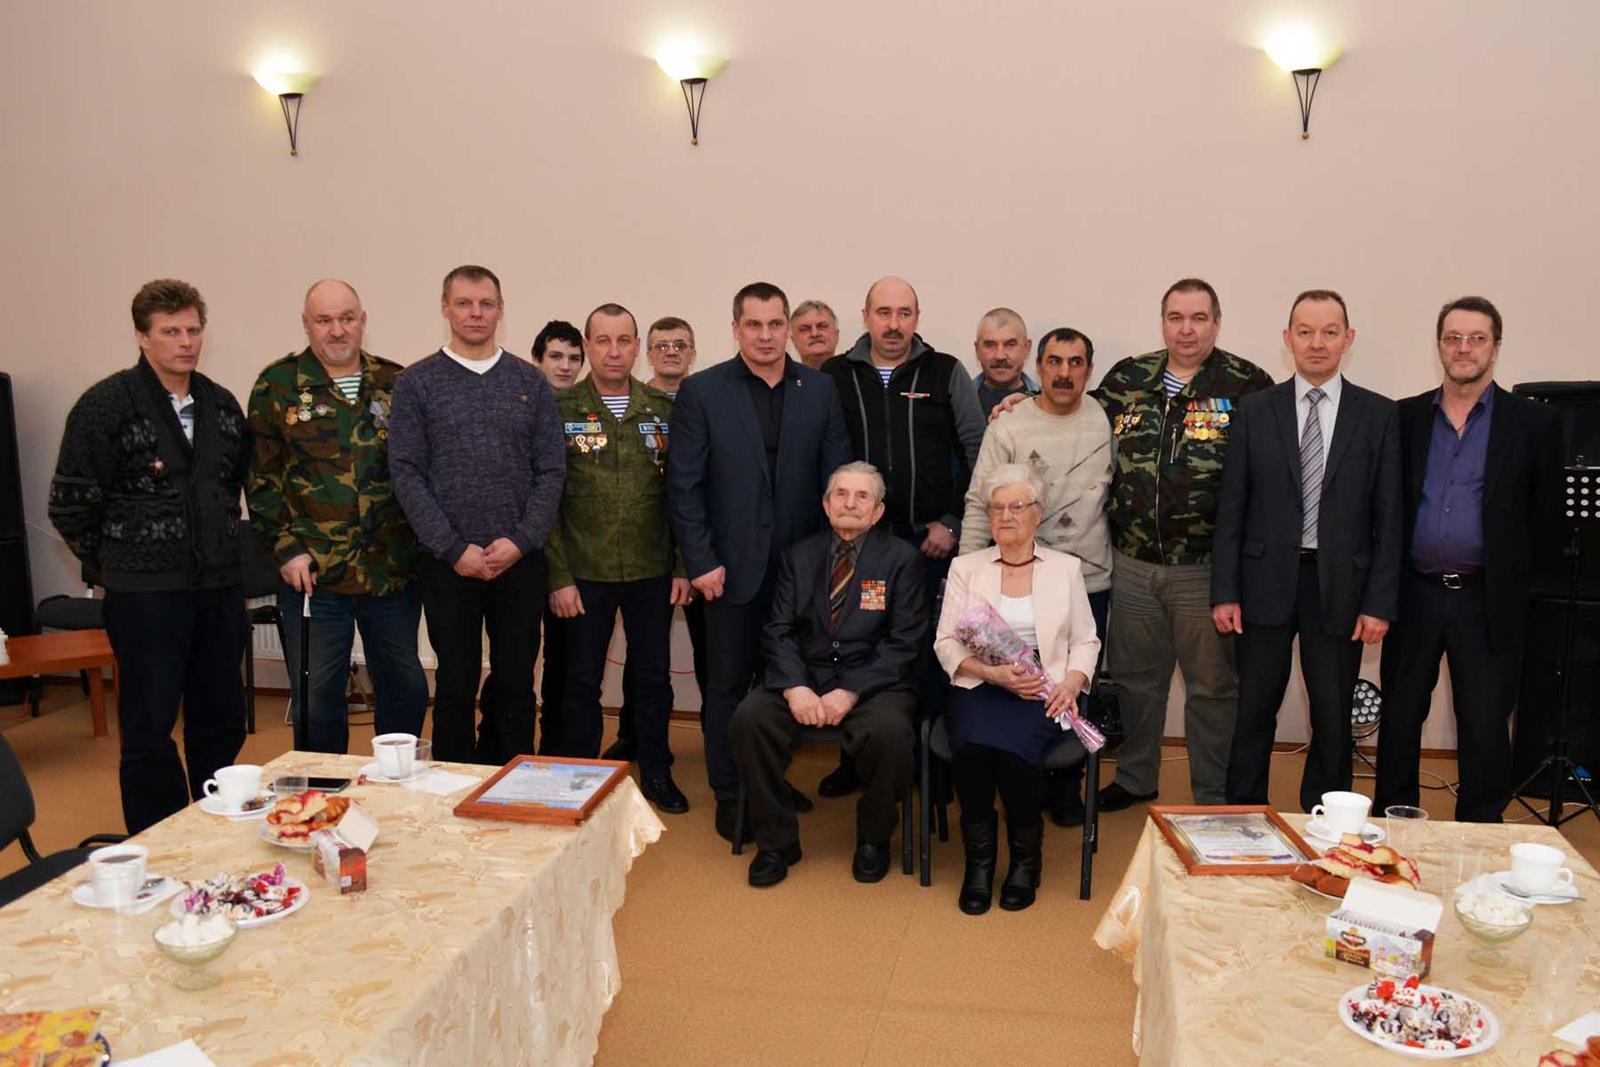 Sosnogorsk_veterany-Afganistana_15.02.2018-4.jpg